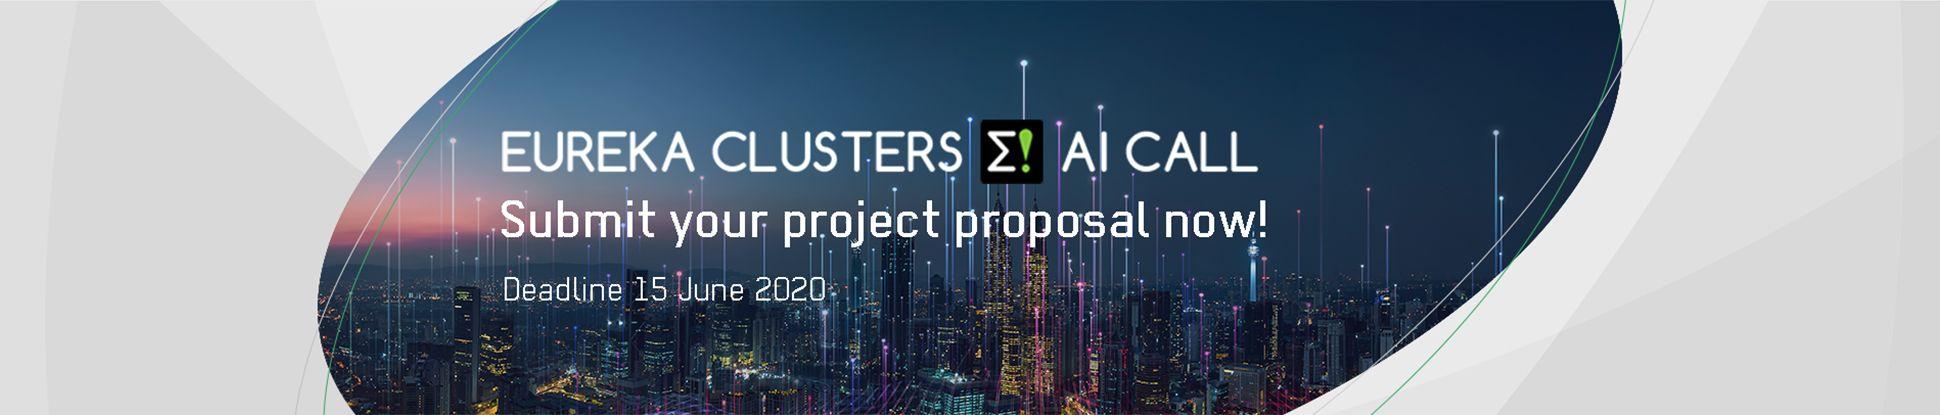 Jumbotron Clusters AI Call 1900x415.jpg